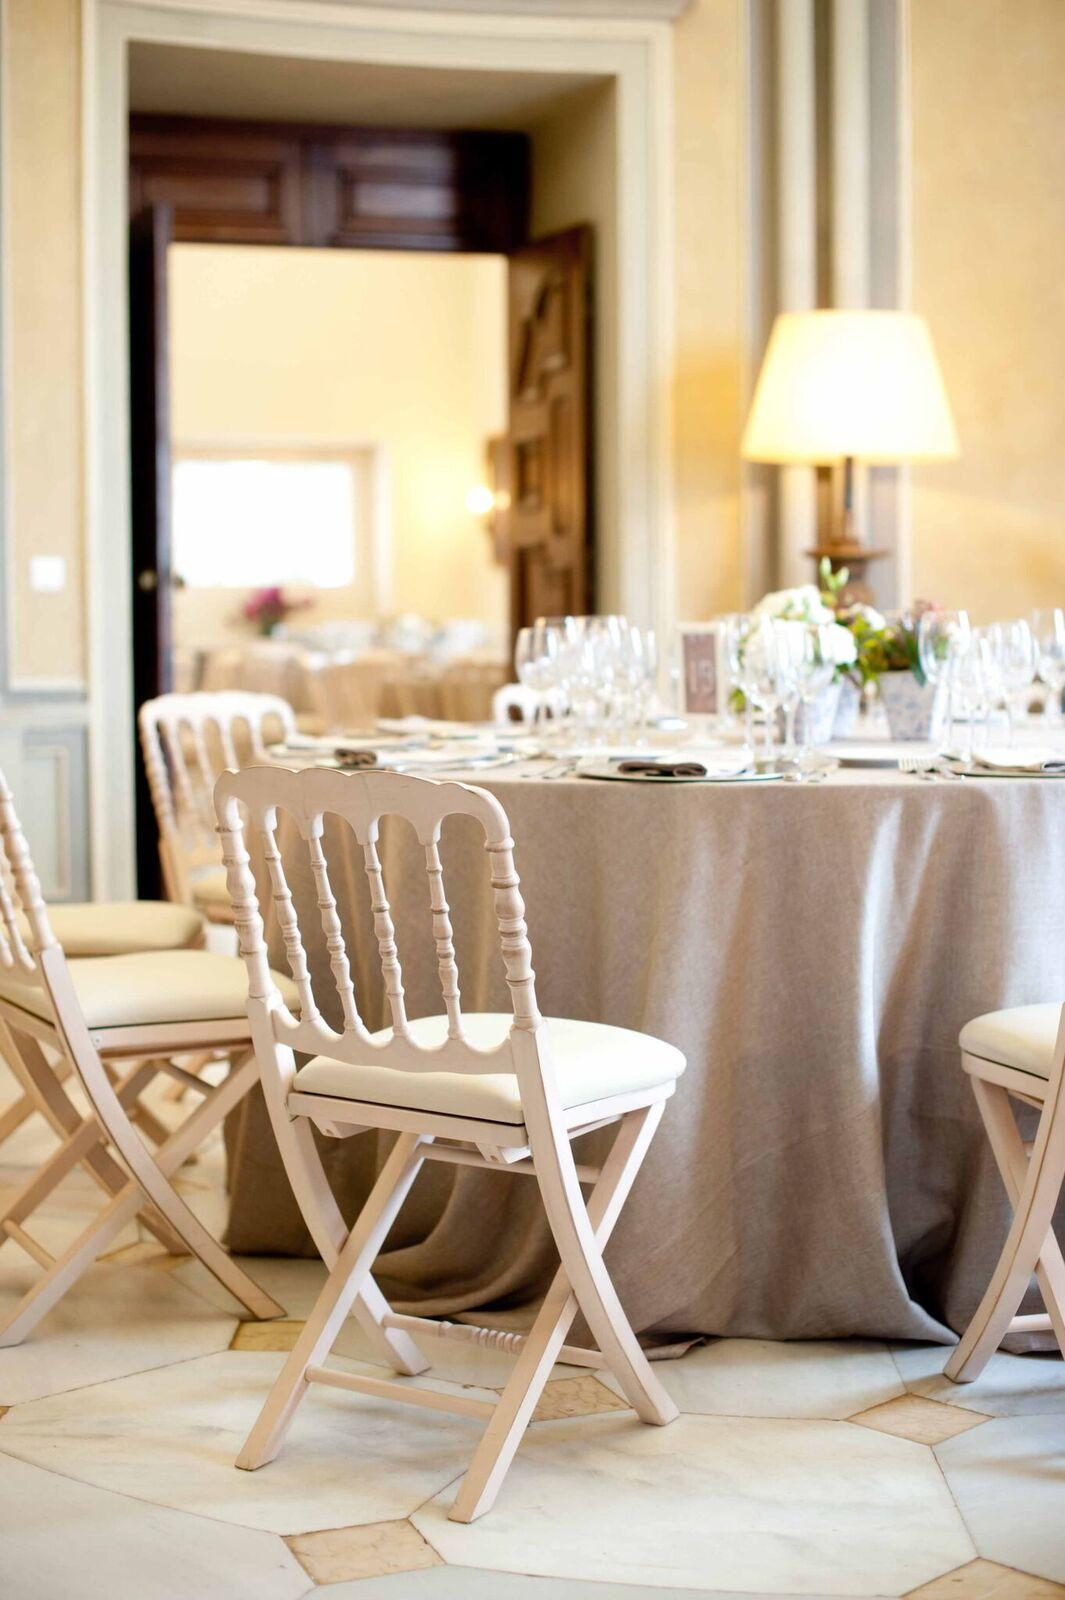 Si-Quiero-Best-Wedding-Planner-Sira-Antequera-Patricia-Javier-008